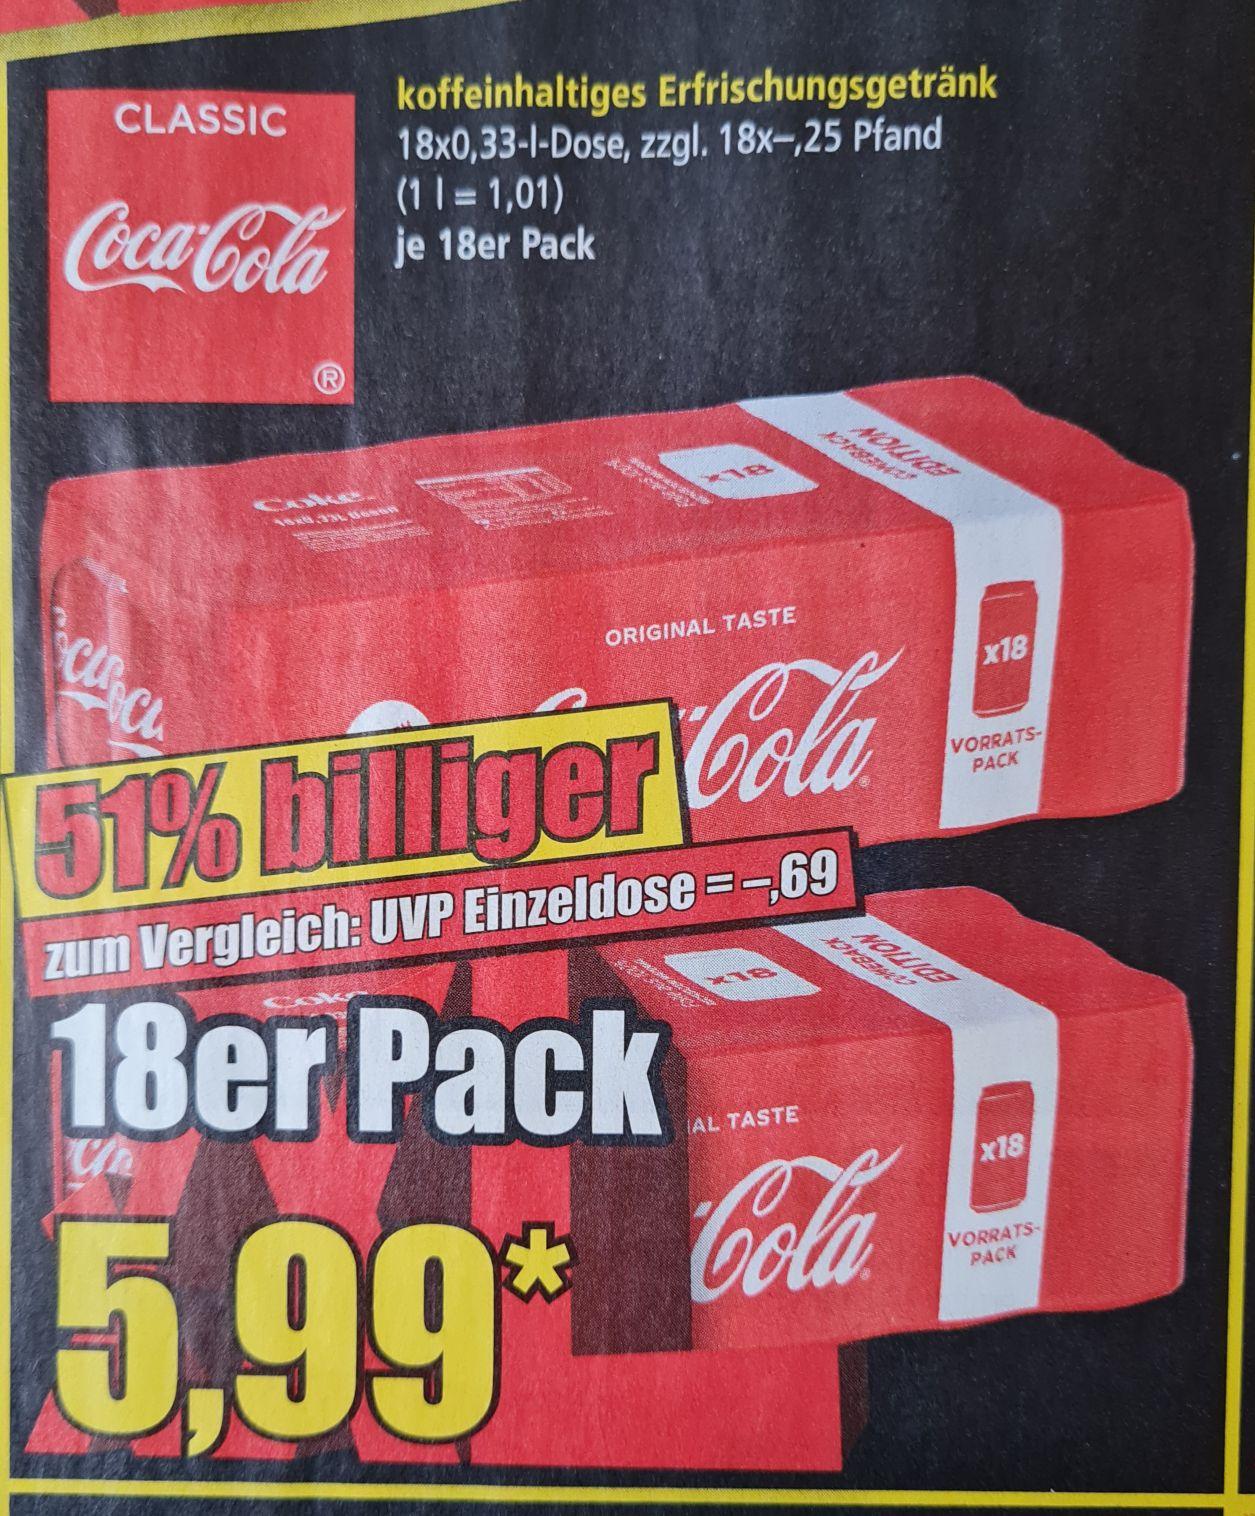 Norma ab 01.03 Coca-Cola Dosen 18x0,33 l